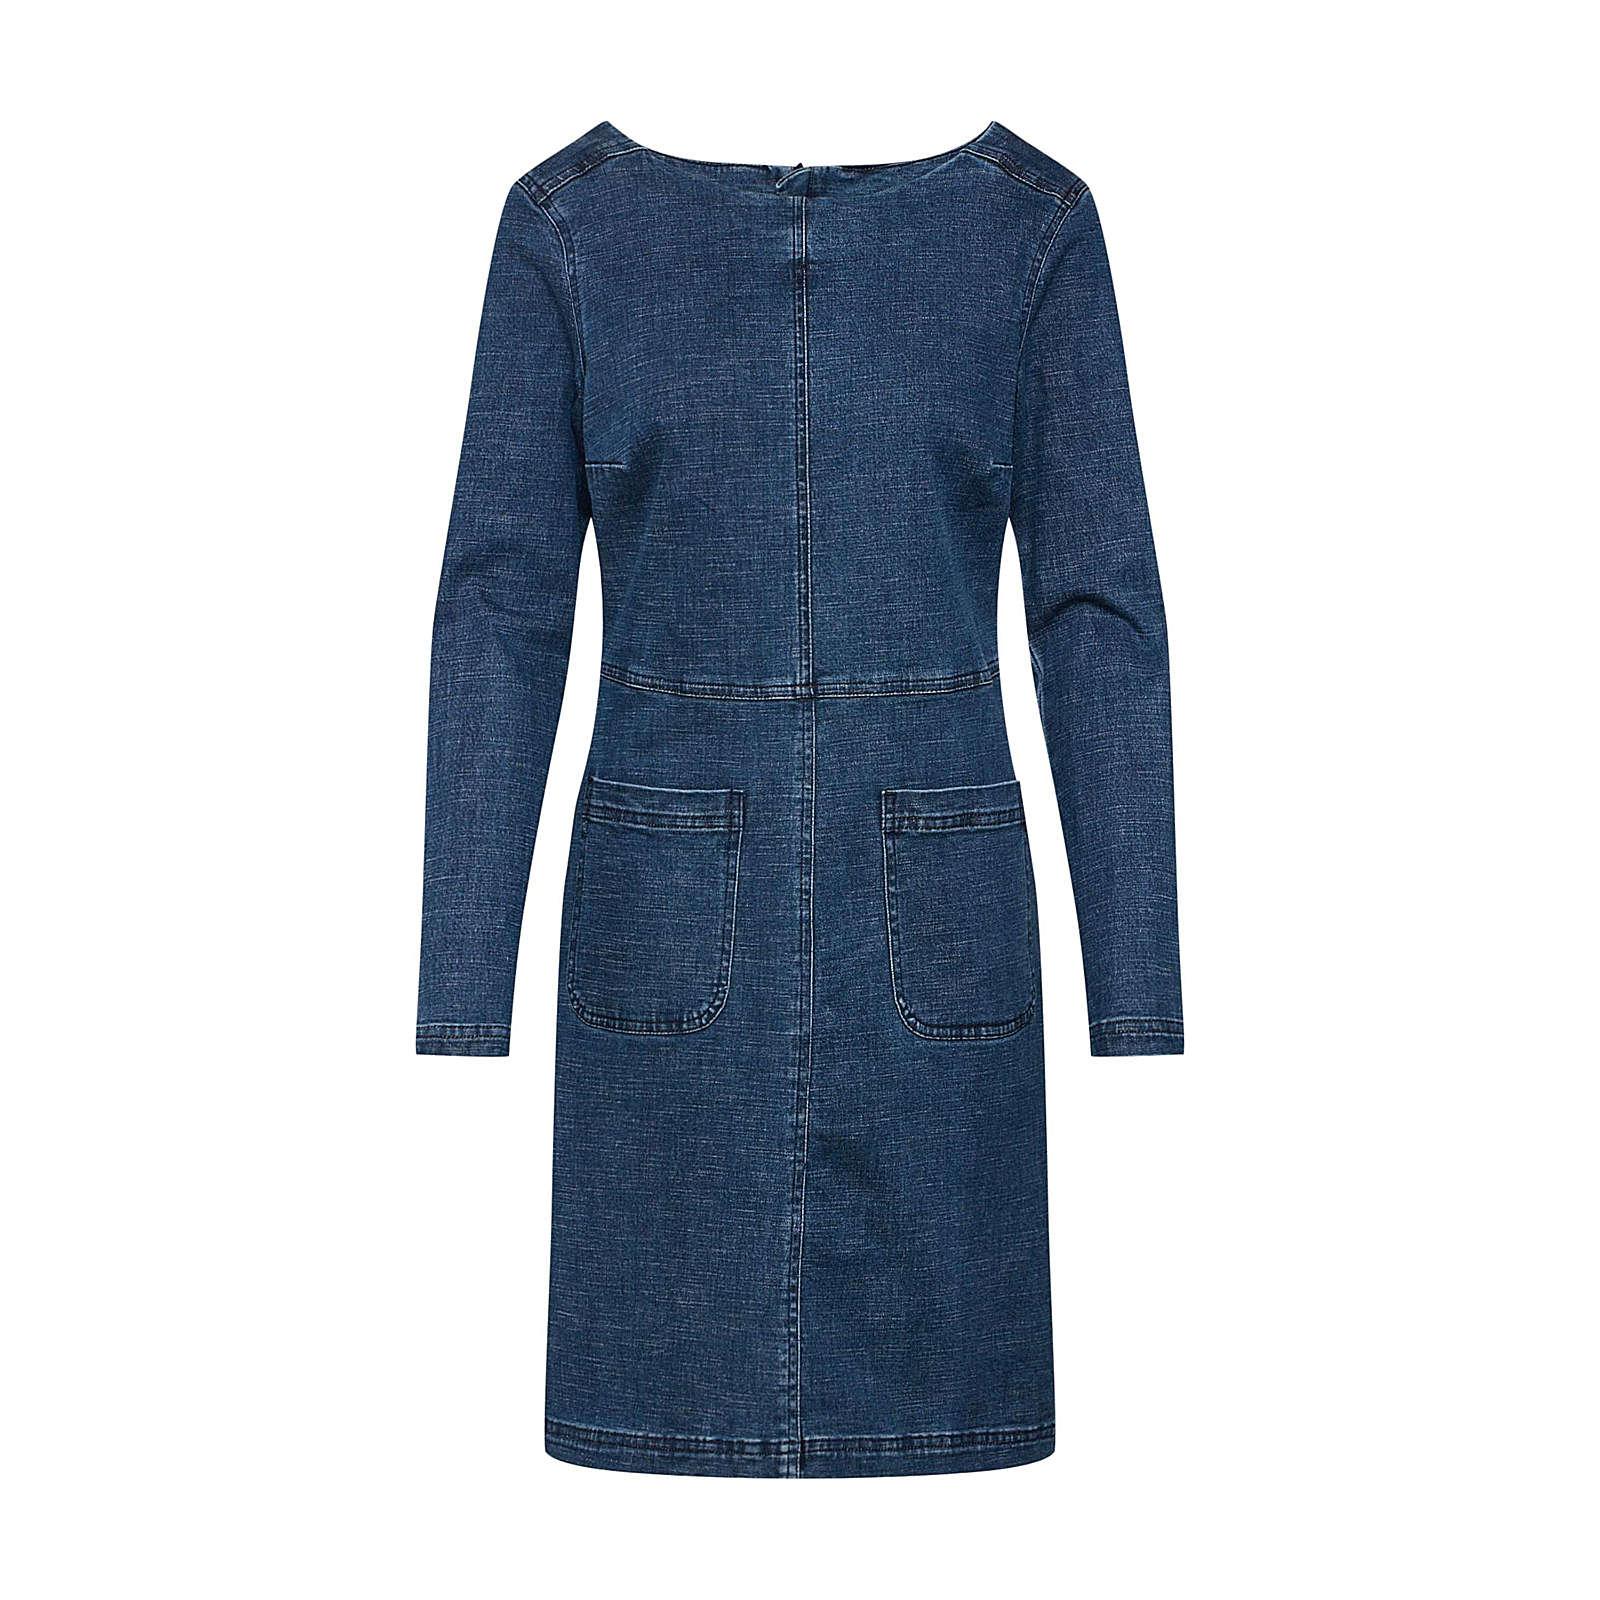 EDC BY ESPRIT Kleid Jeanskleider blue denim Damen Gr. 38